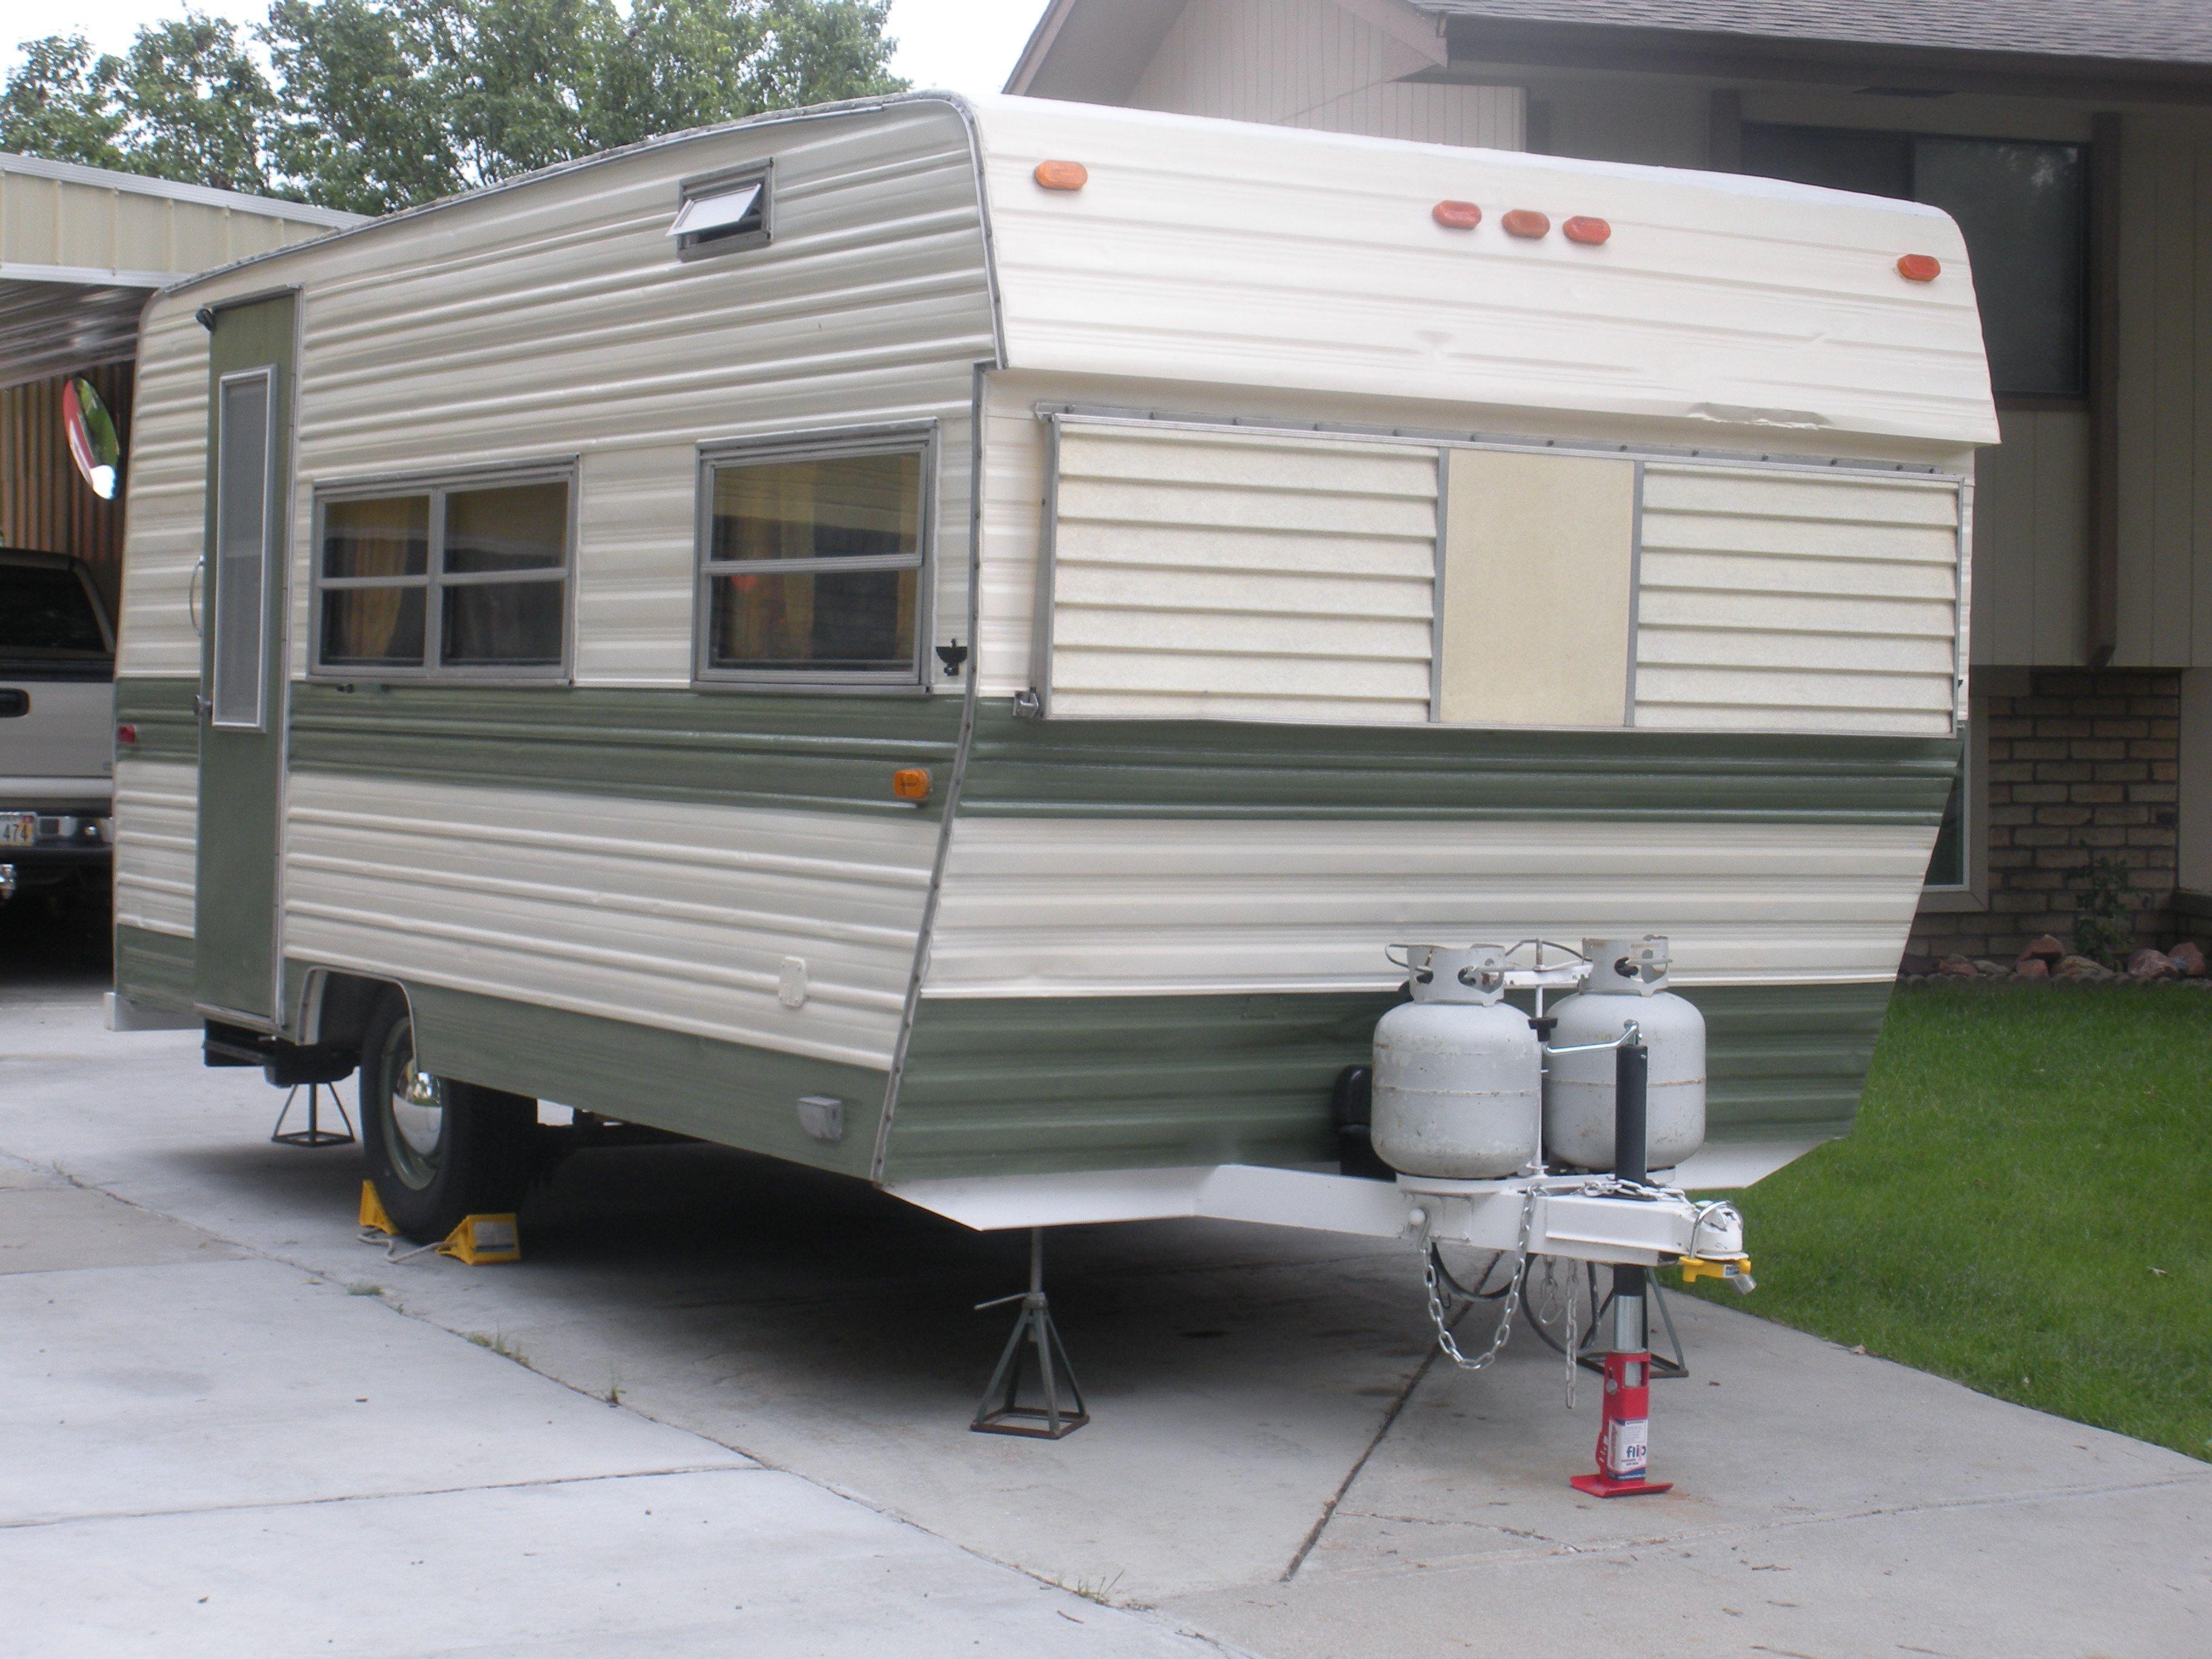 remodeled 1972 prowler camper  [ 3648 x 2736 Pixel ]